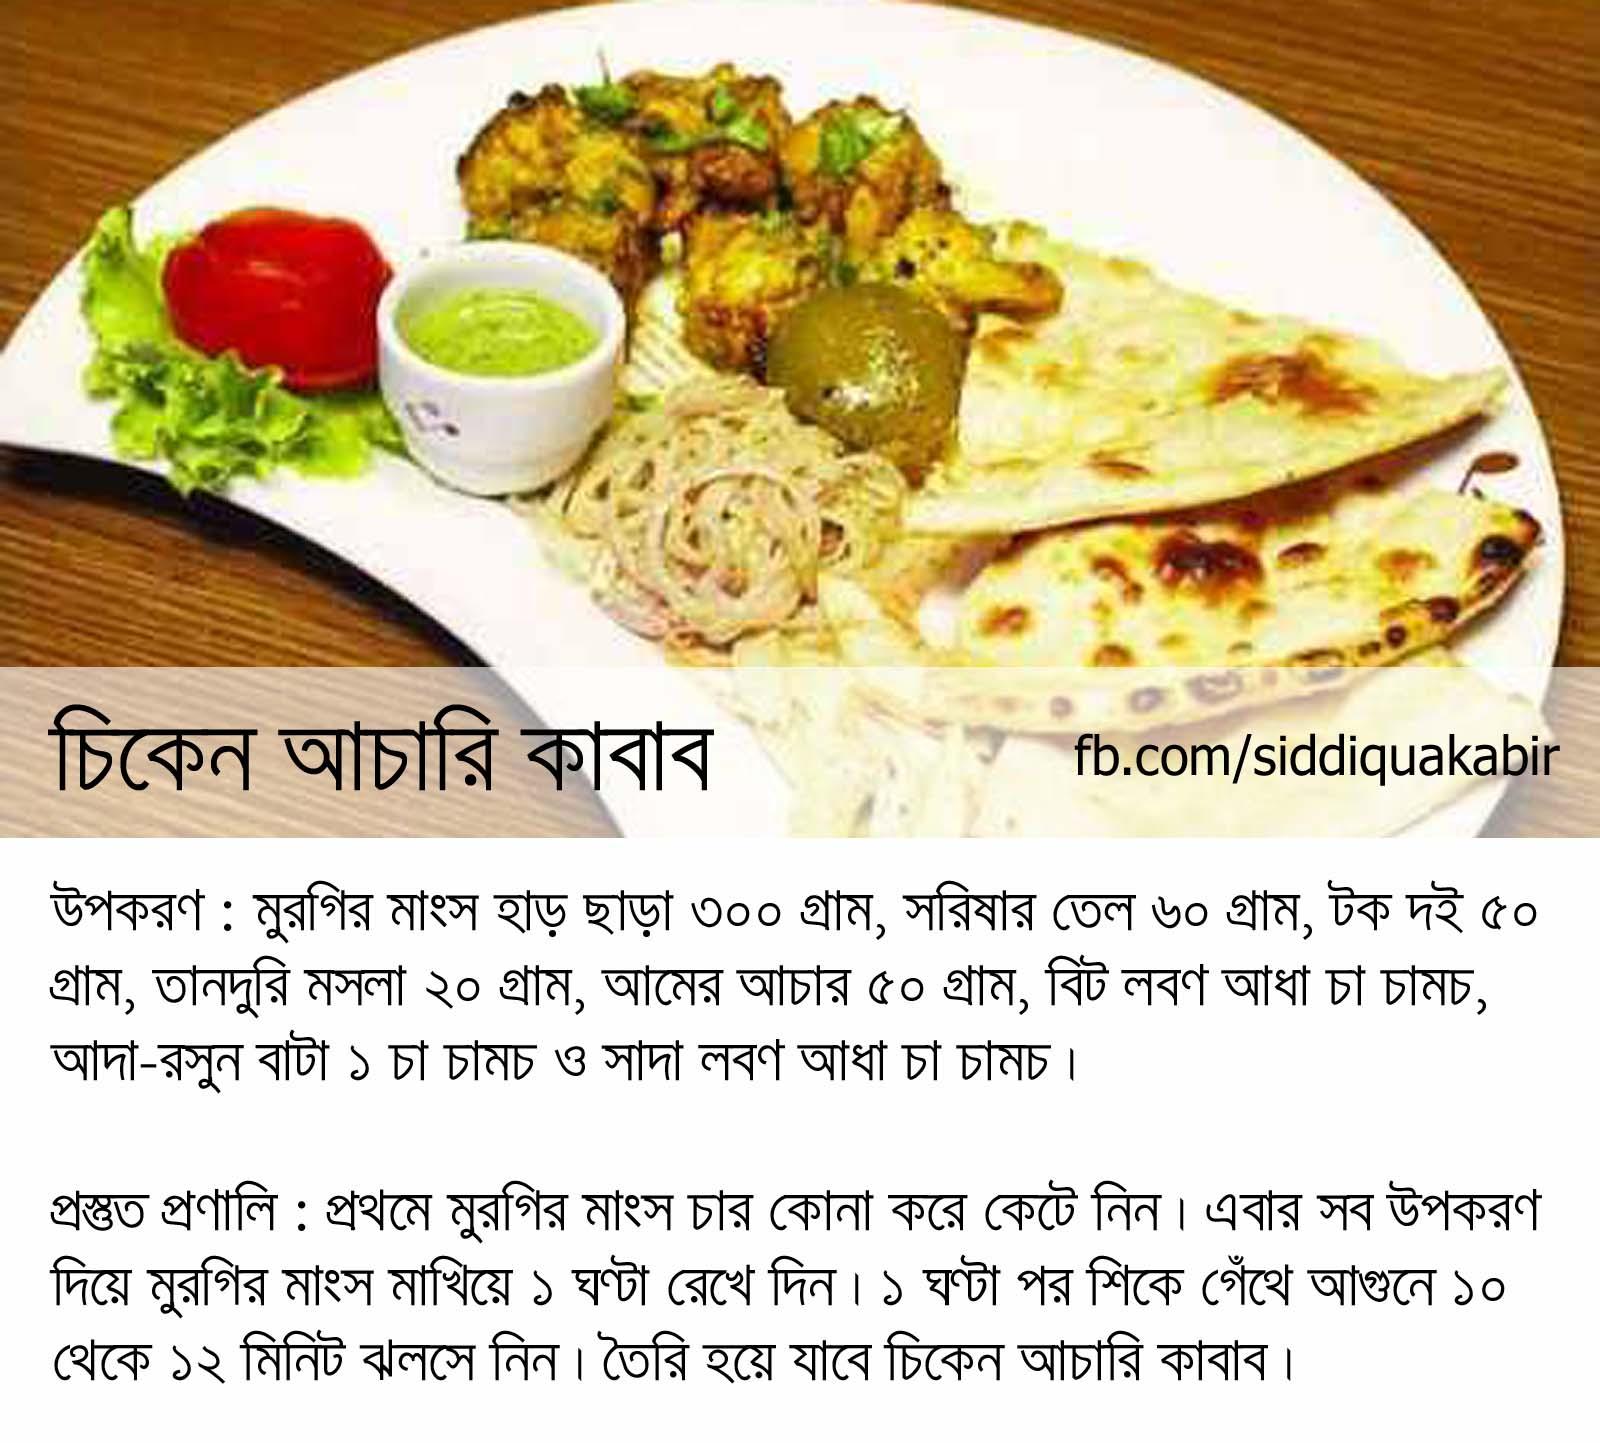 Siddiqua kabir bengali recipe chicken achari kabab bengali recipe chicken achari kabab forumfinder Image collections